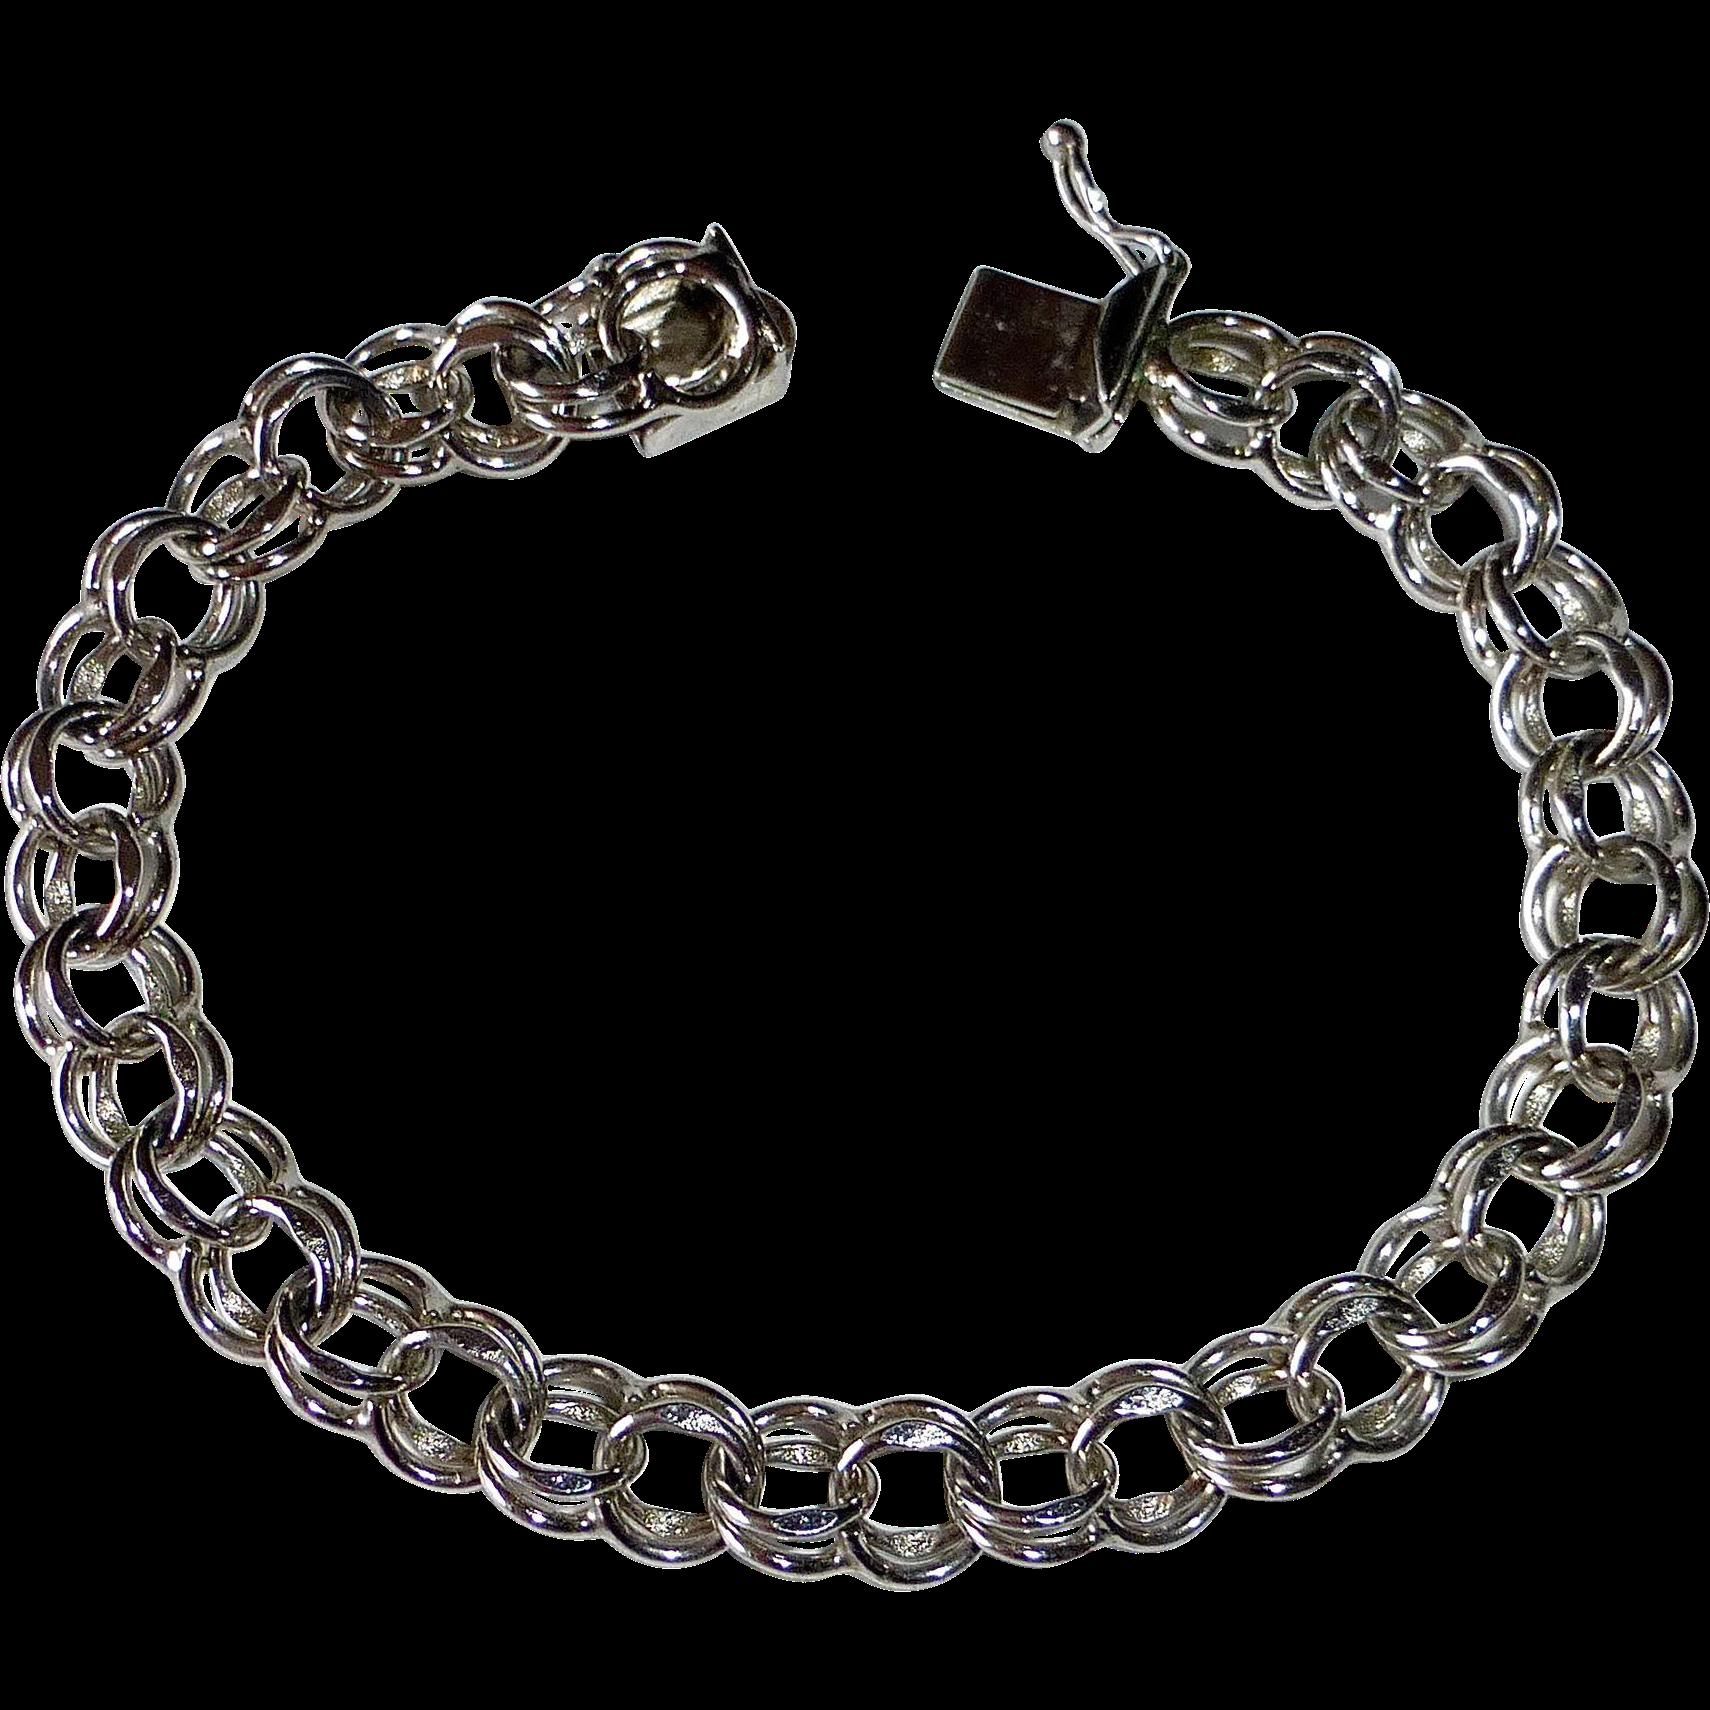 sterling link starter charm bracelet from rubylane